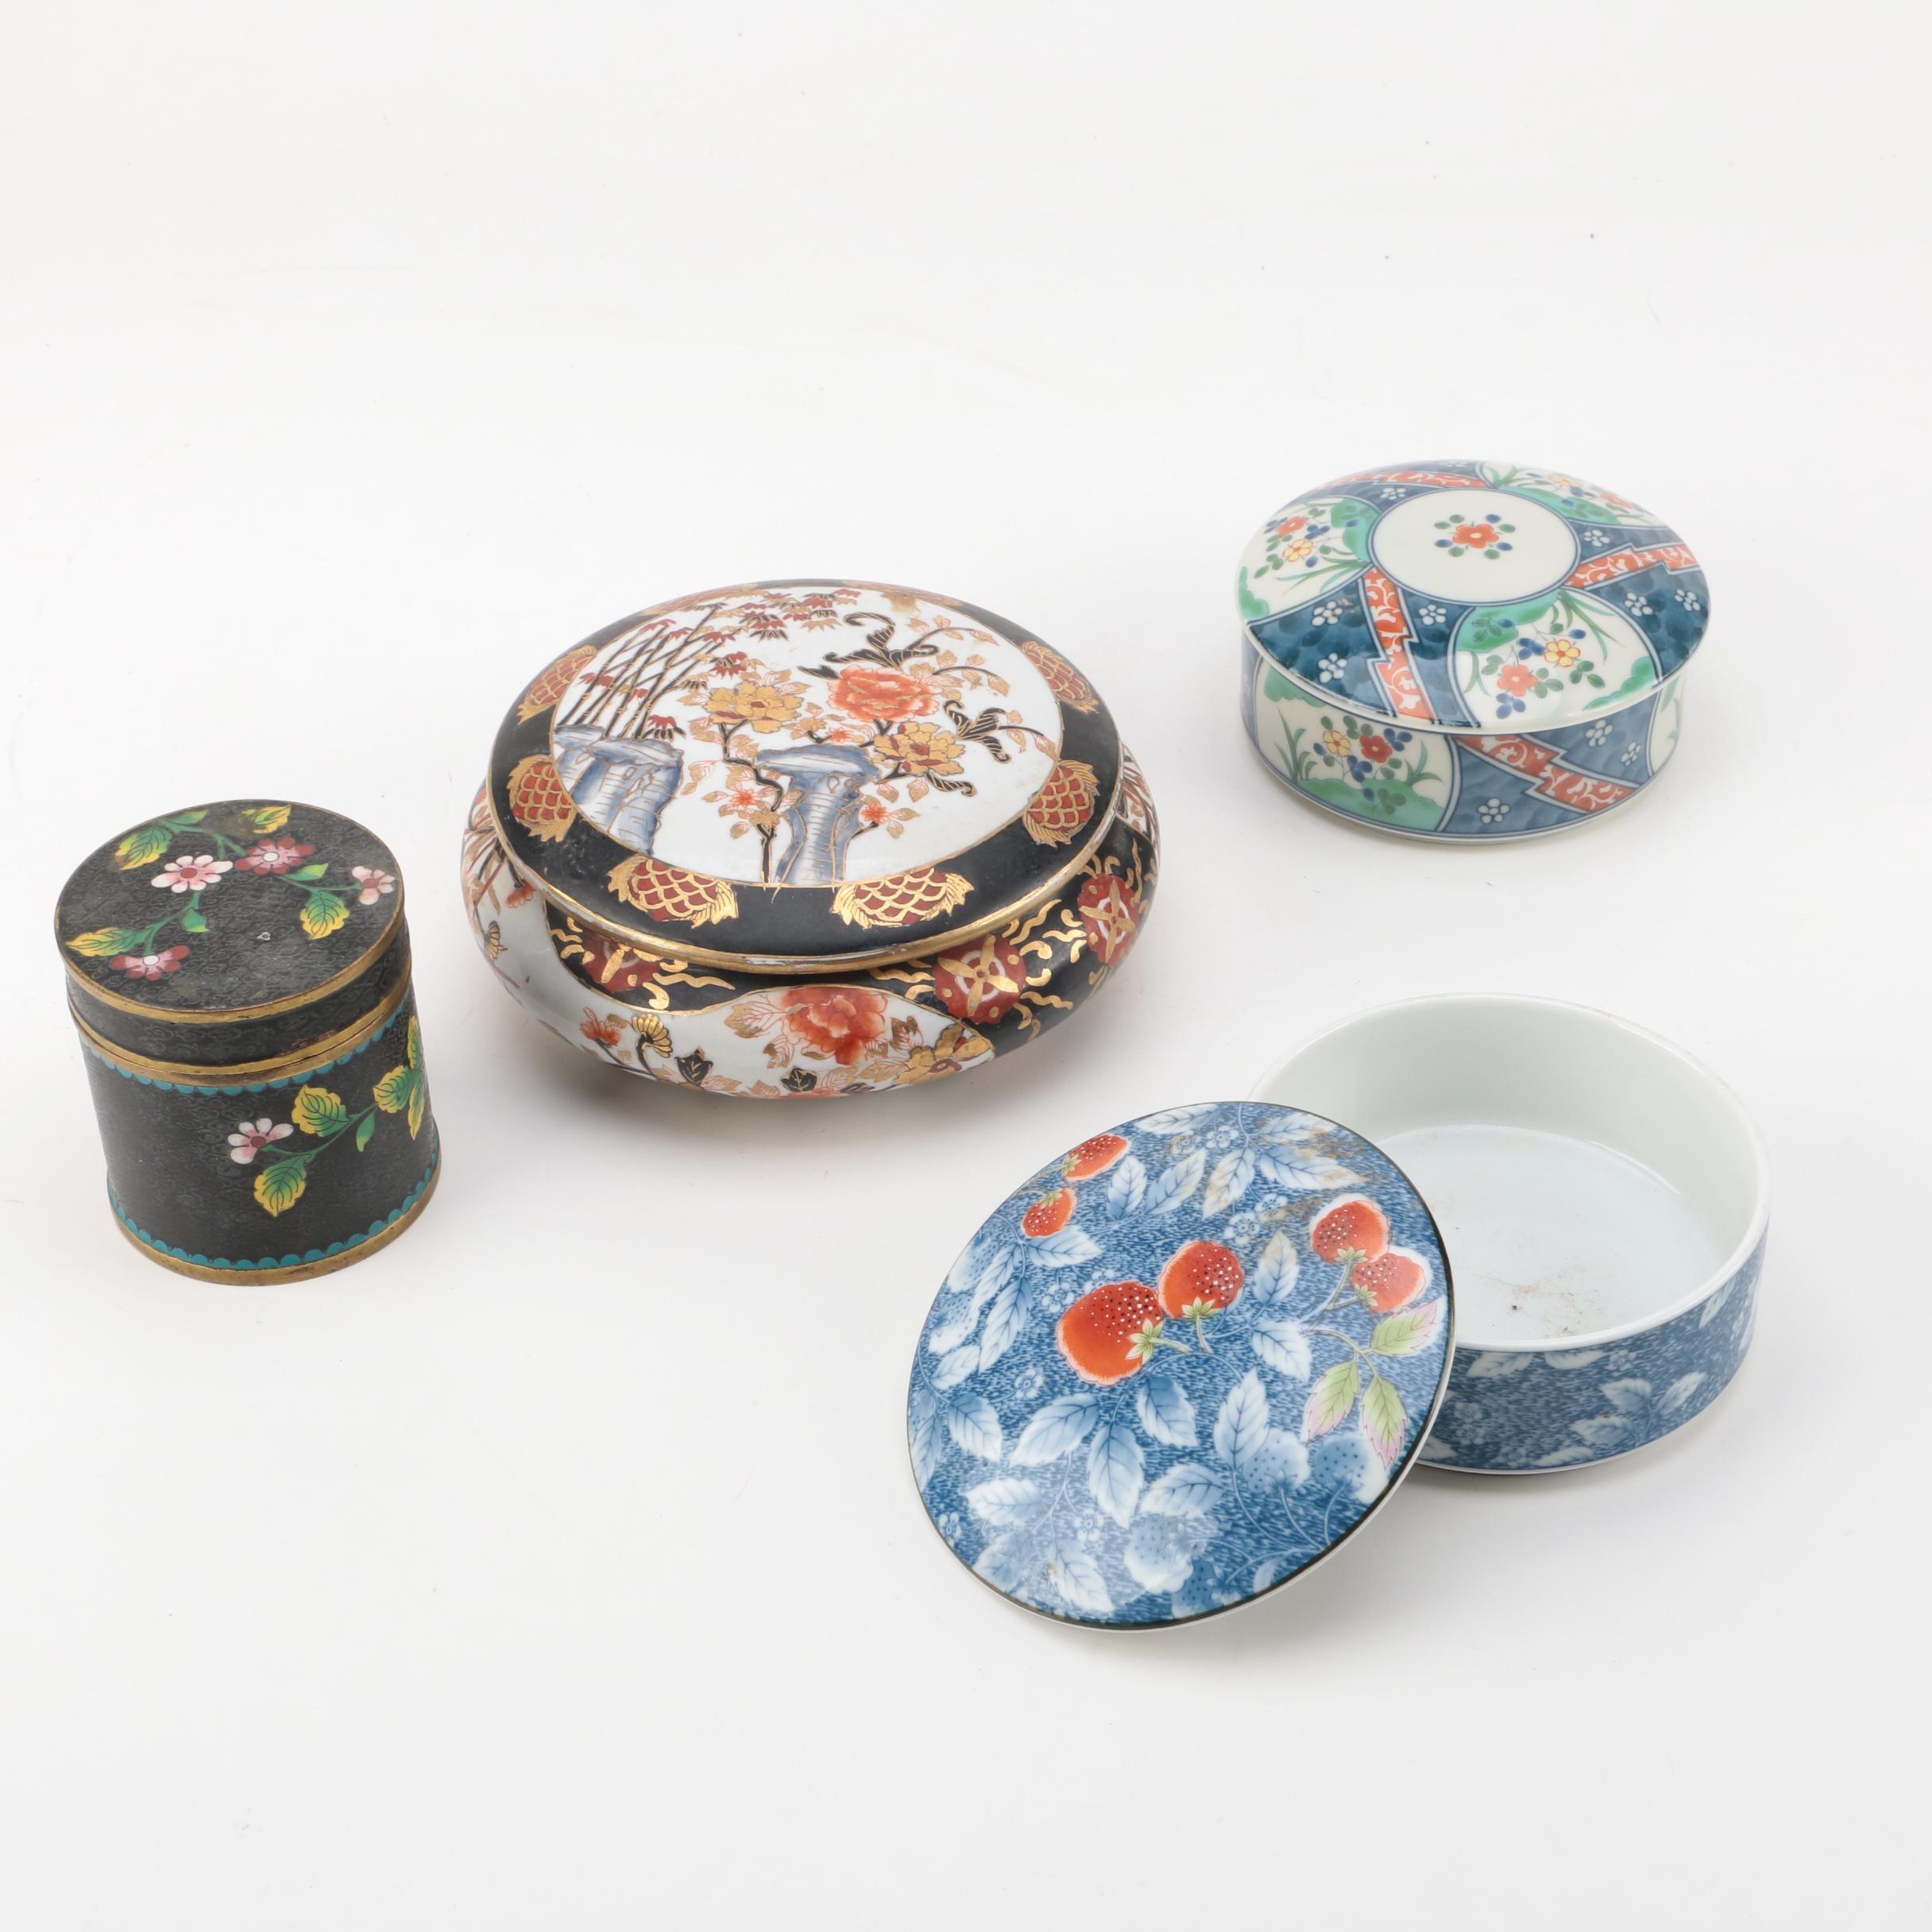 Enameled Brass Trinket Box and Assorted Porcelain Trinket Boxes